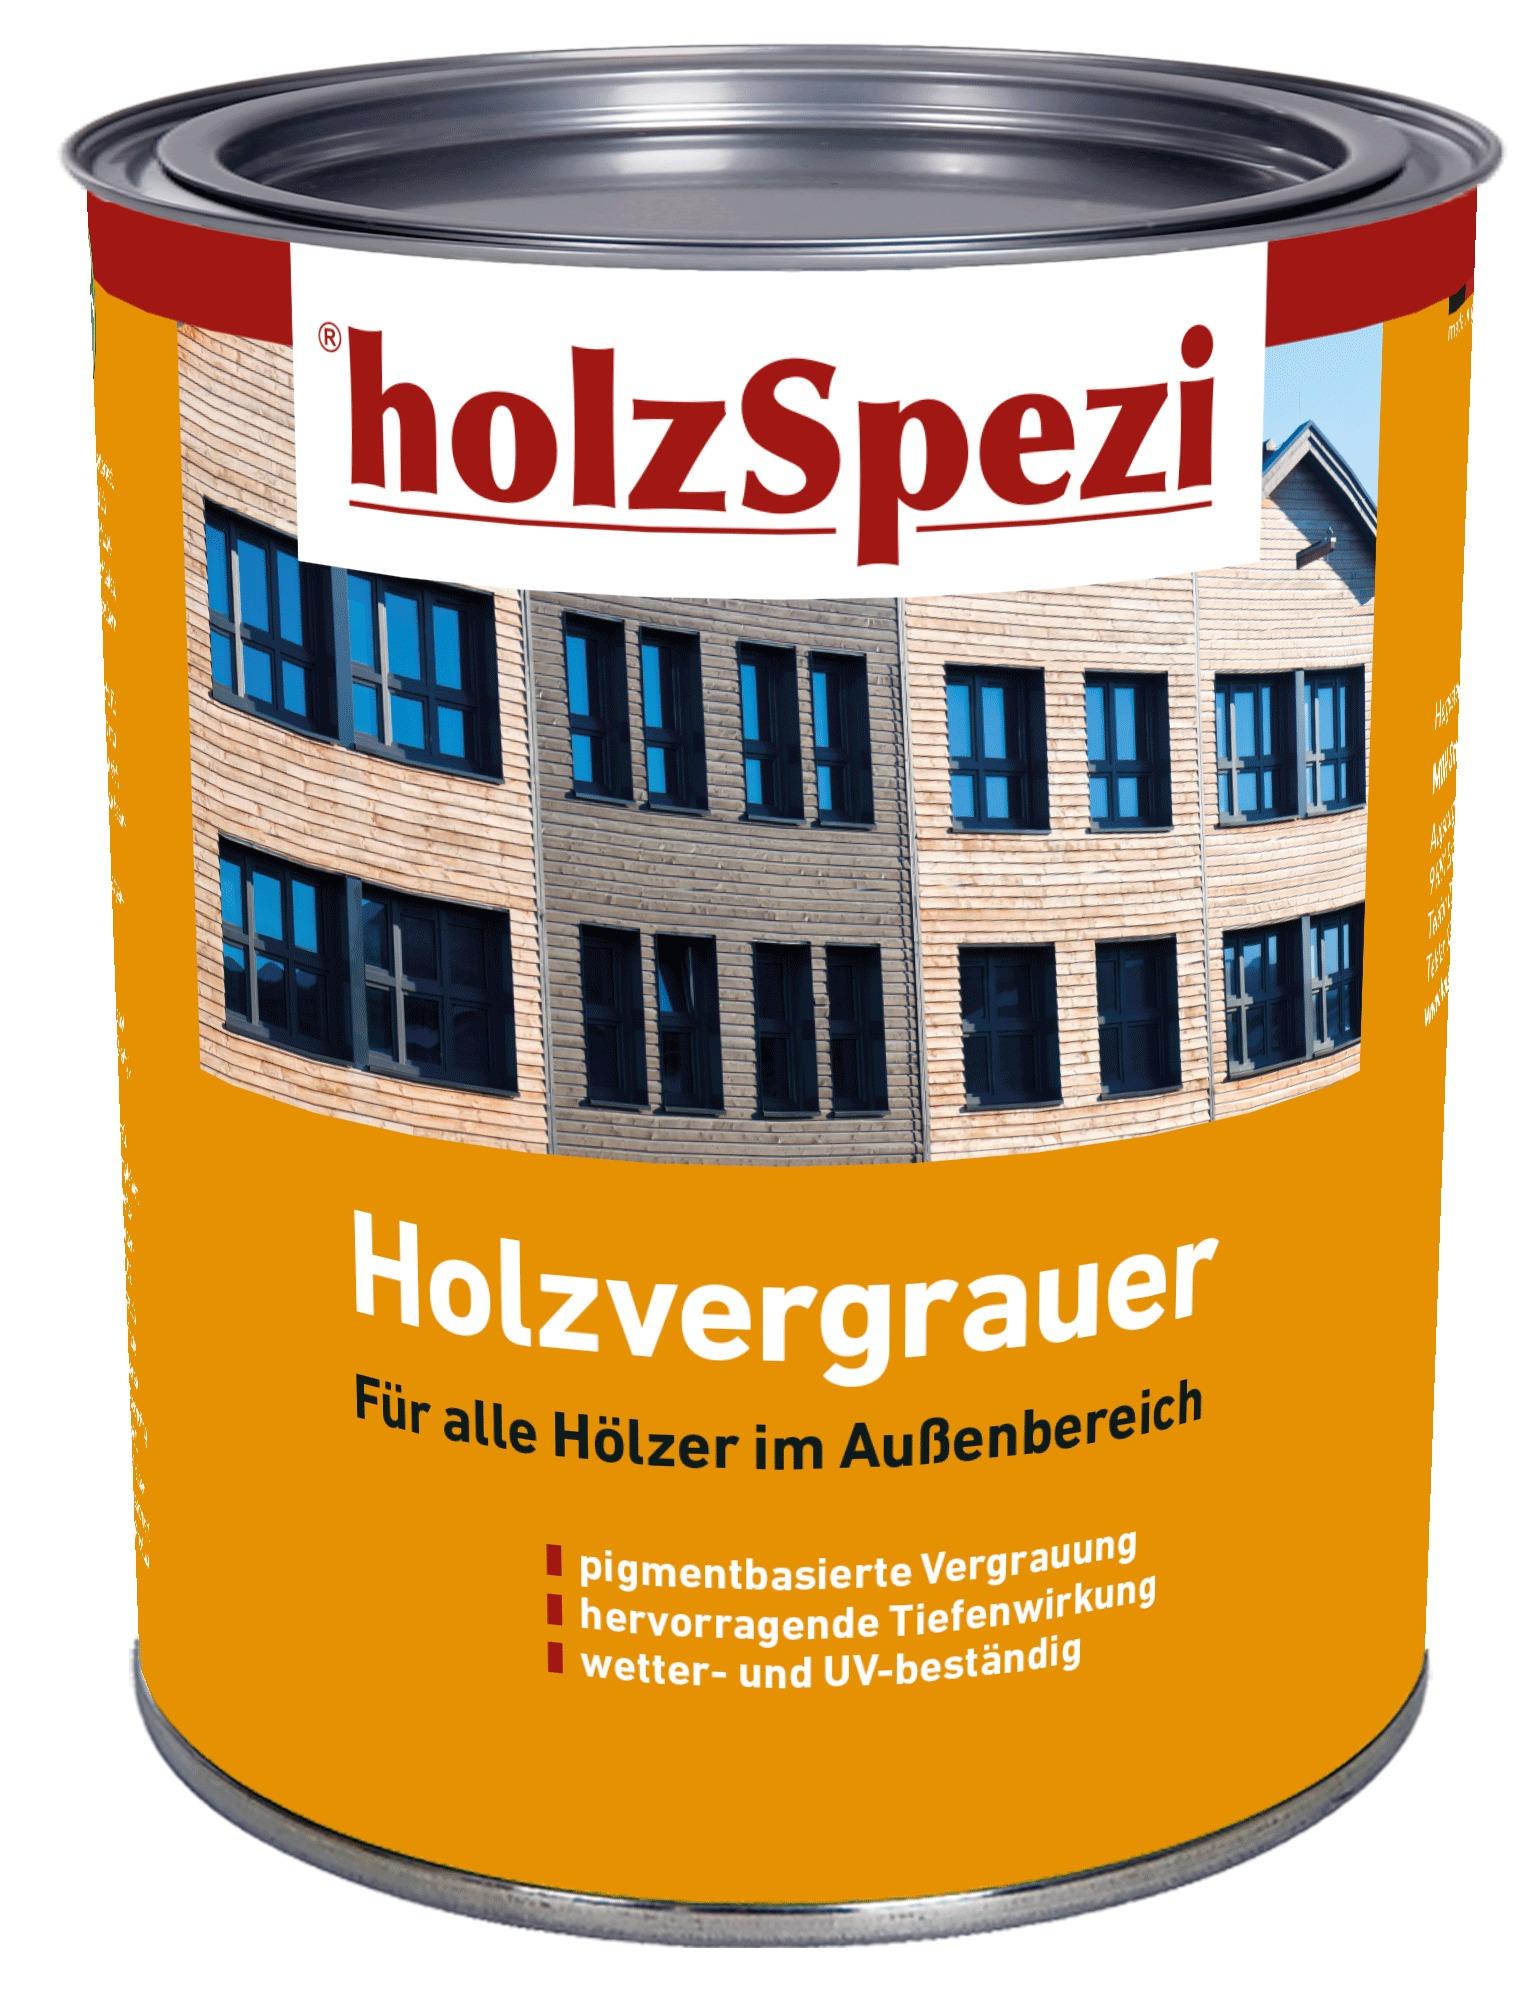 holzSpezi Holzvergrauer (eigenfarbe 0,75 Liter)